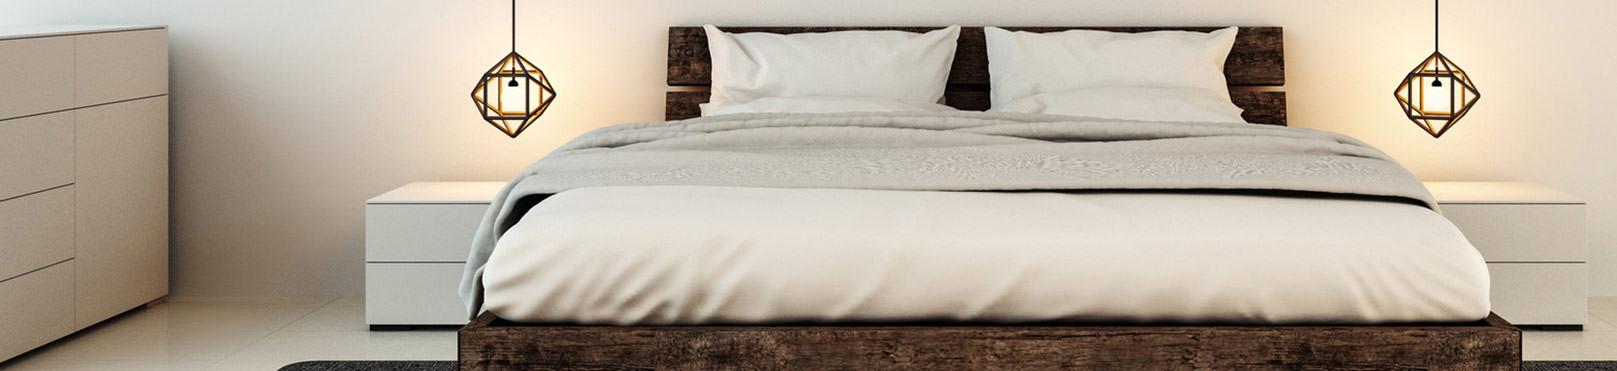 betten in k ln der 7 himmel matratzenfachgesch ft in k ln. Black Bedroom Furniture Sets. Home Design Ideas